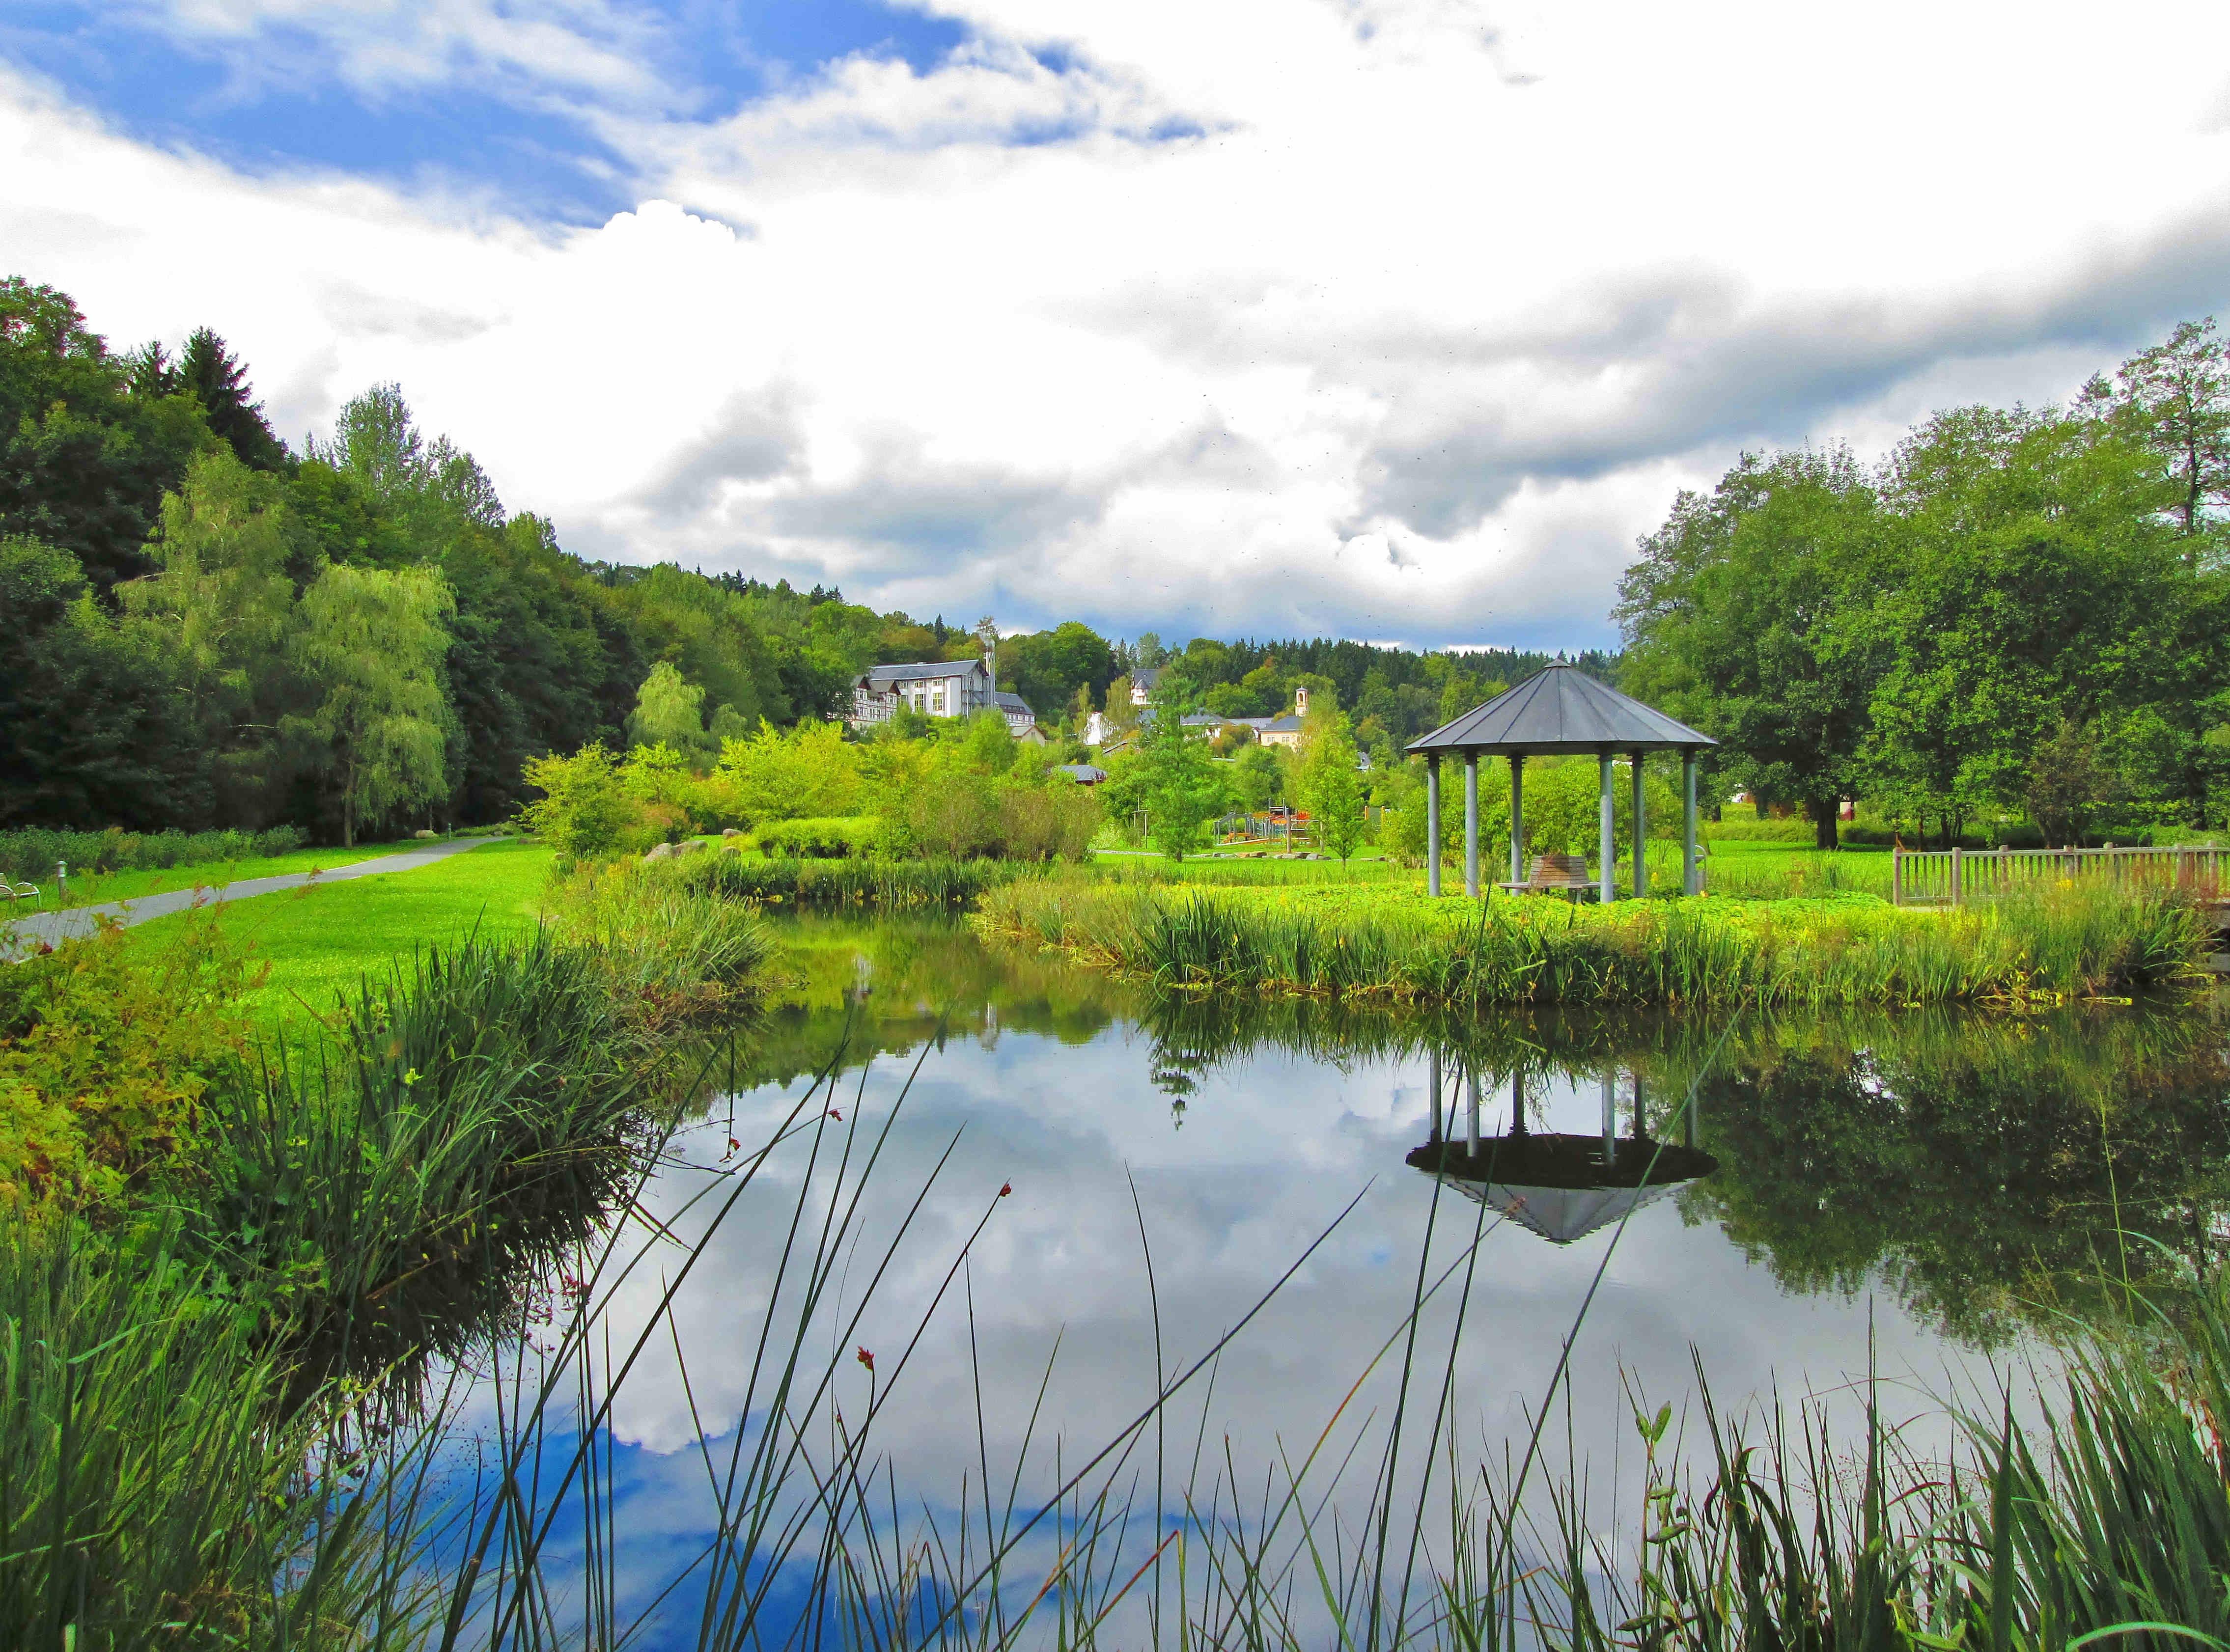 Thermalbad Wiesenbad - Kurpark